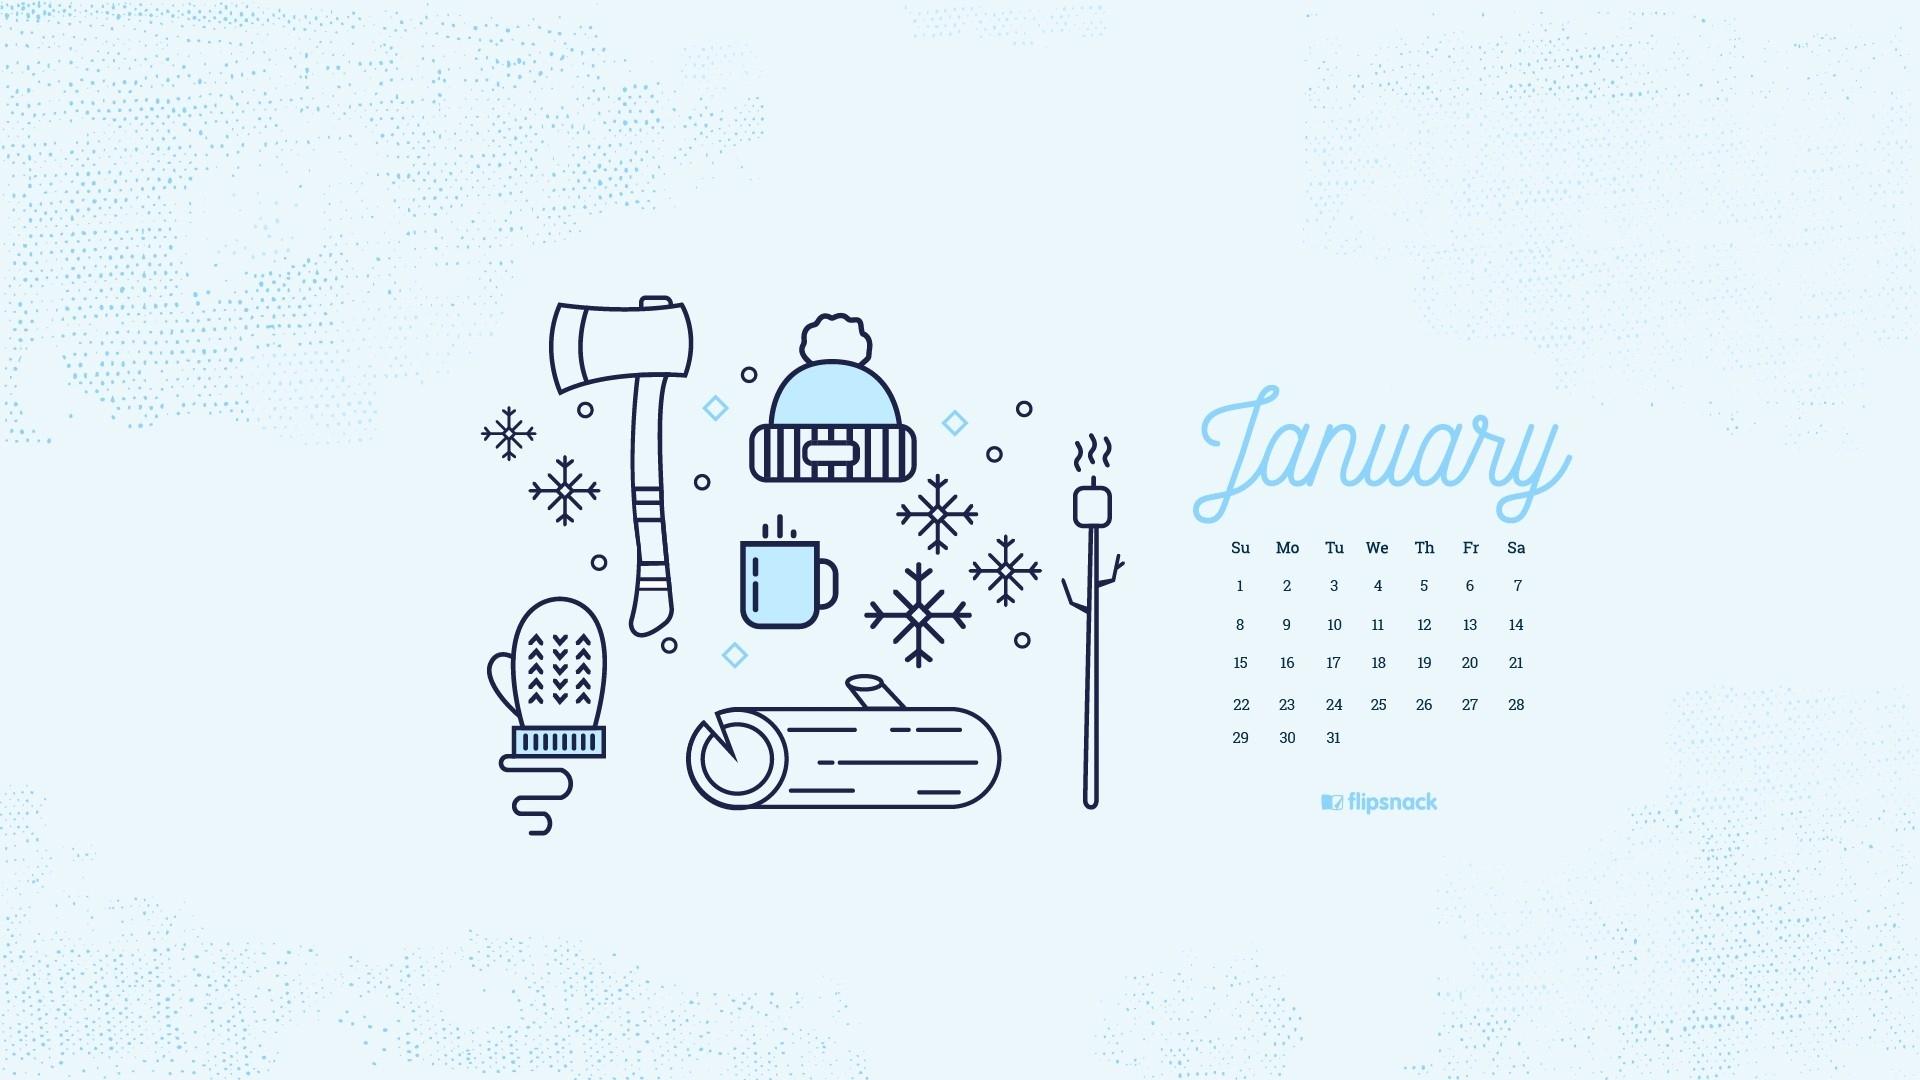 december 2017 january 2018 calendar wallpaper - wallpaper rocket